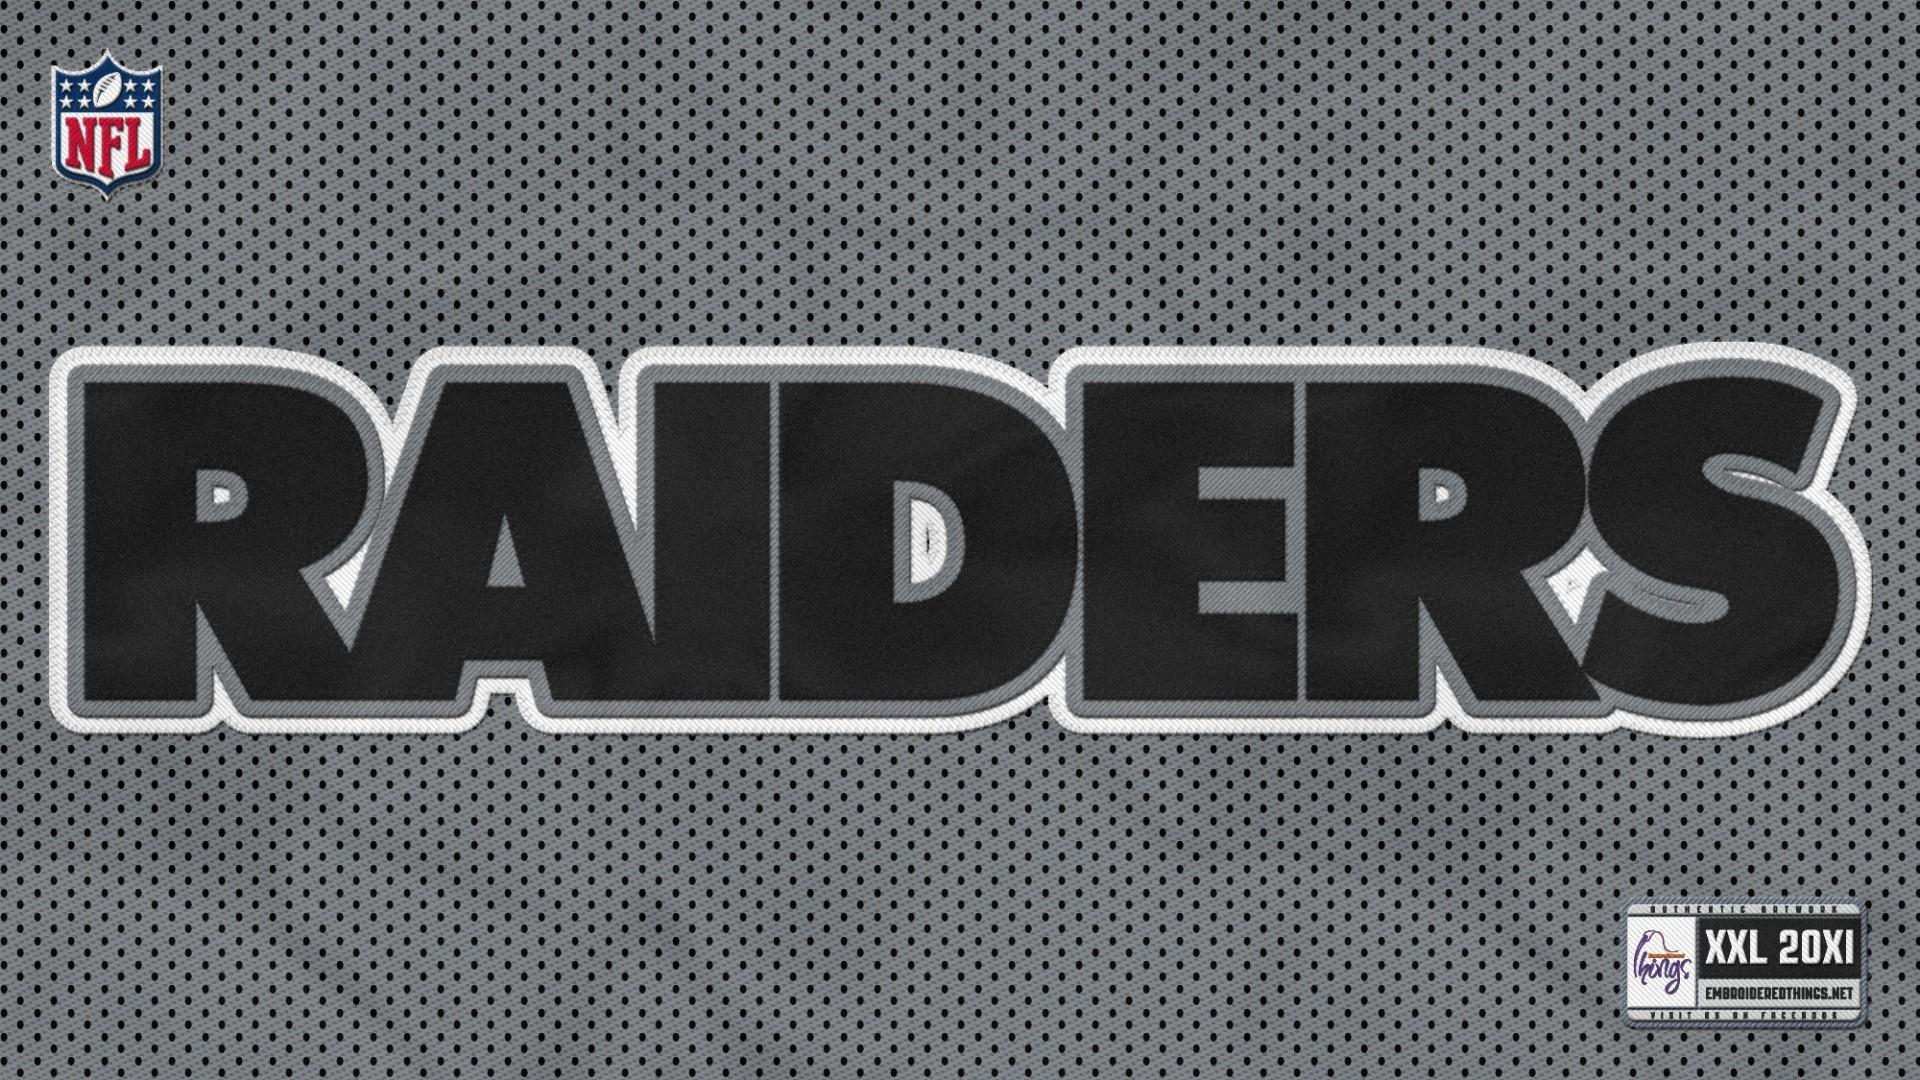 2013 Oakland Raiders football nfl g wallpaper